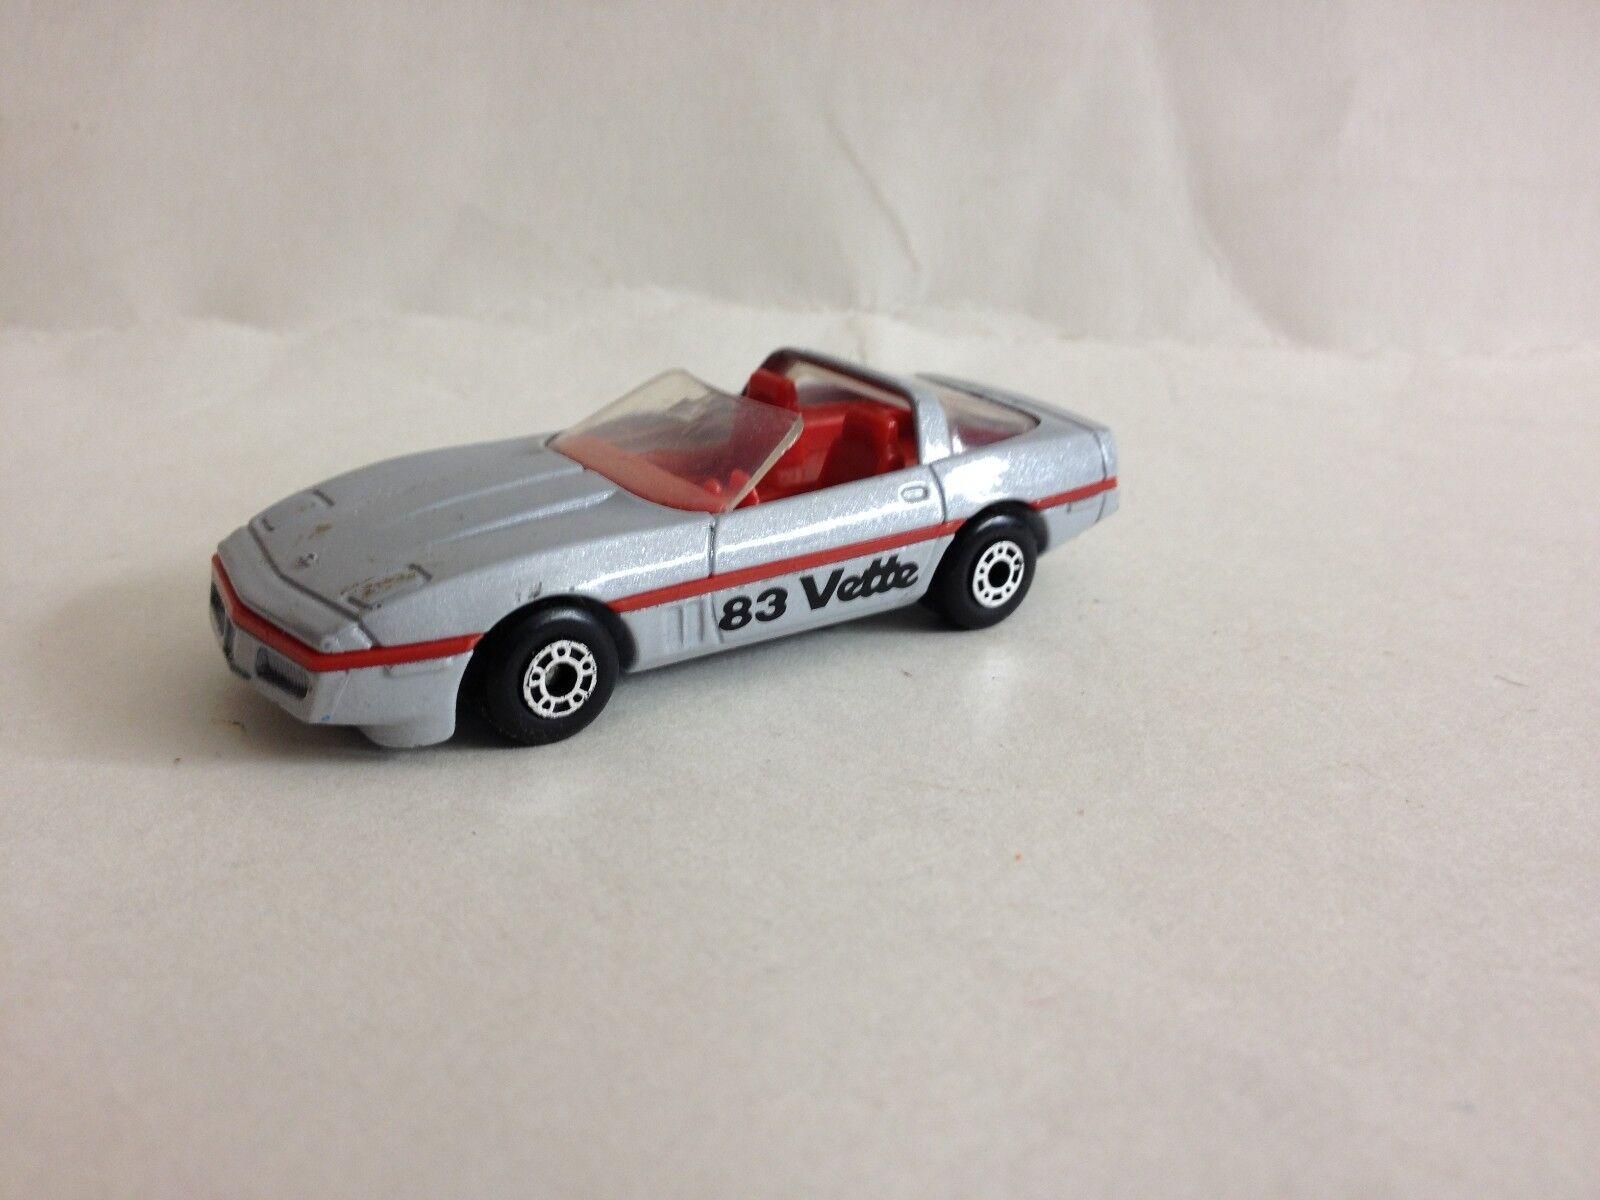 1983 Matchbox Superfast 14 605m83 Rot Corvette Corvette Neu IN Verpackung